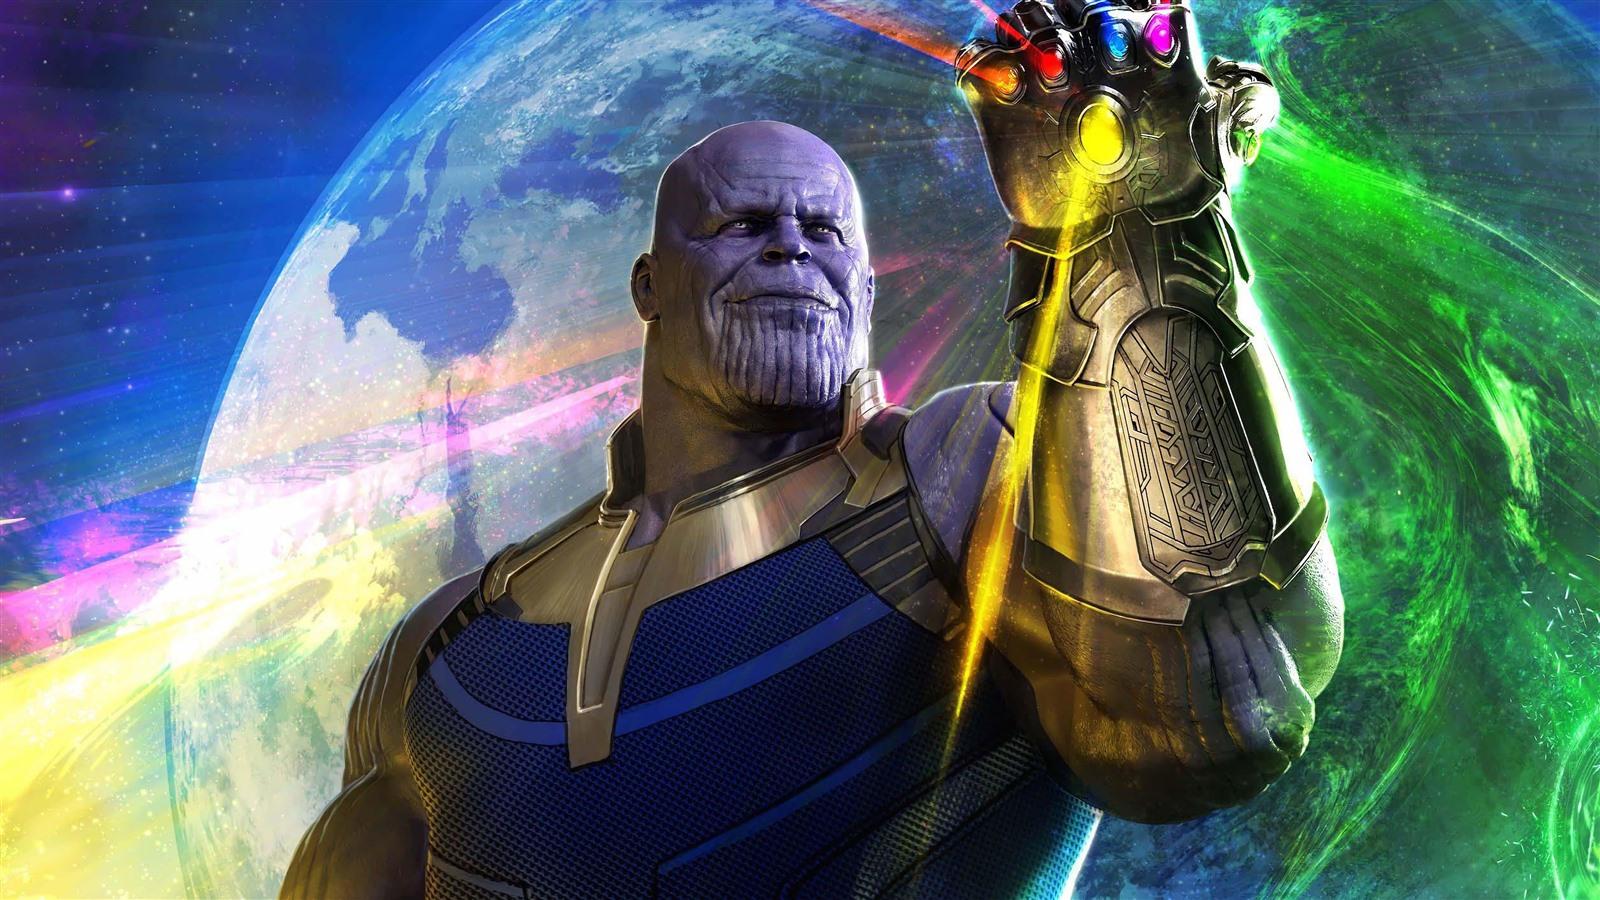 Avengers Infinity War 2018 Thanos 4k Uhd 3 2 3840x2560: Fondos De Pantalla Thanos, Avengers: Infinity War